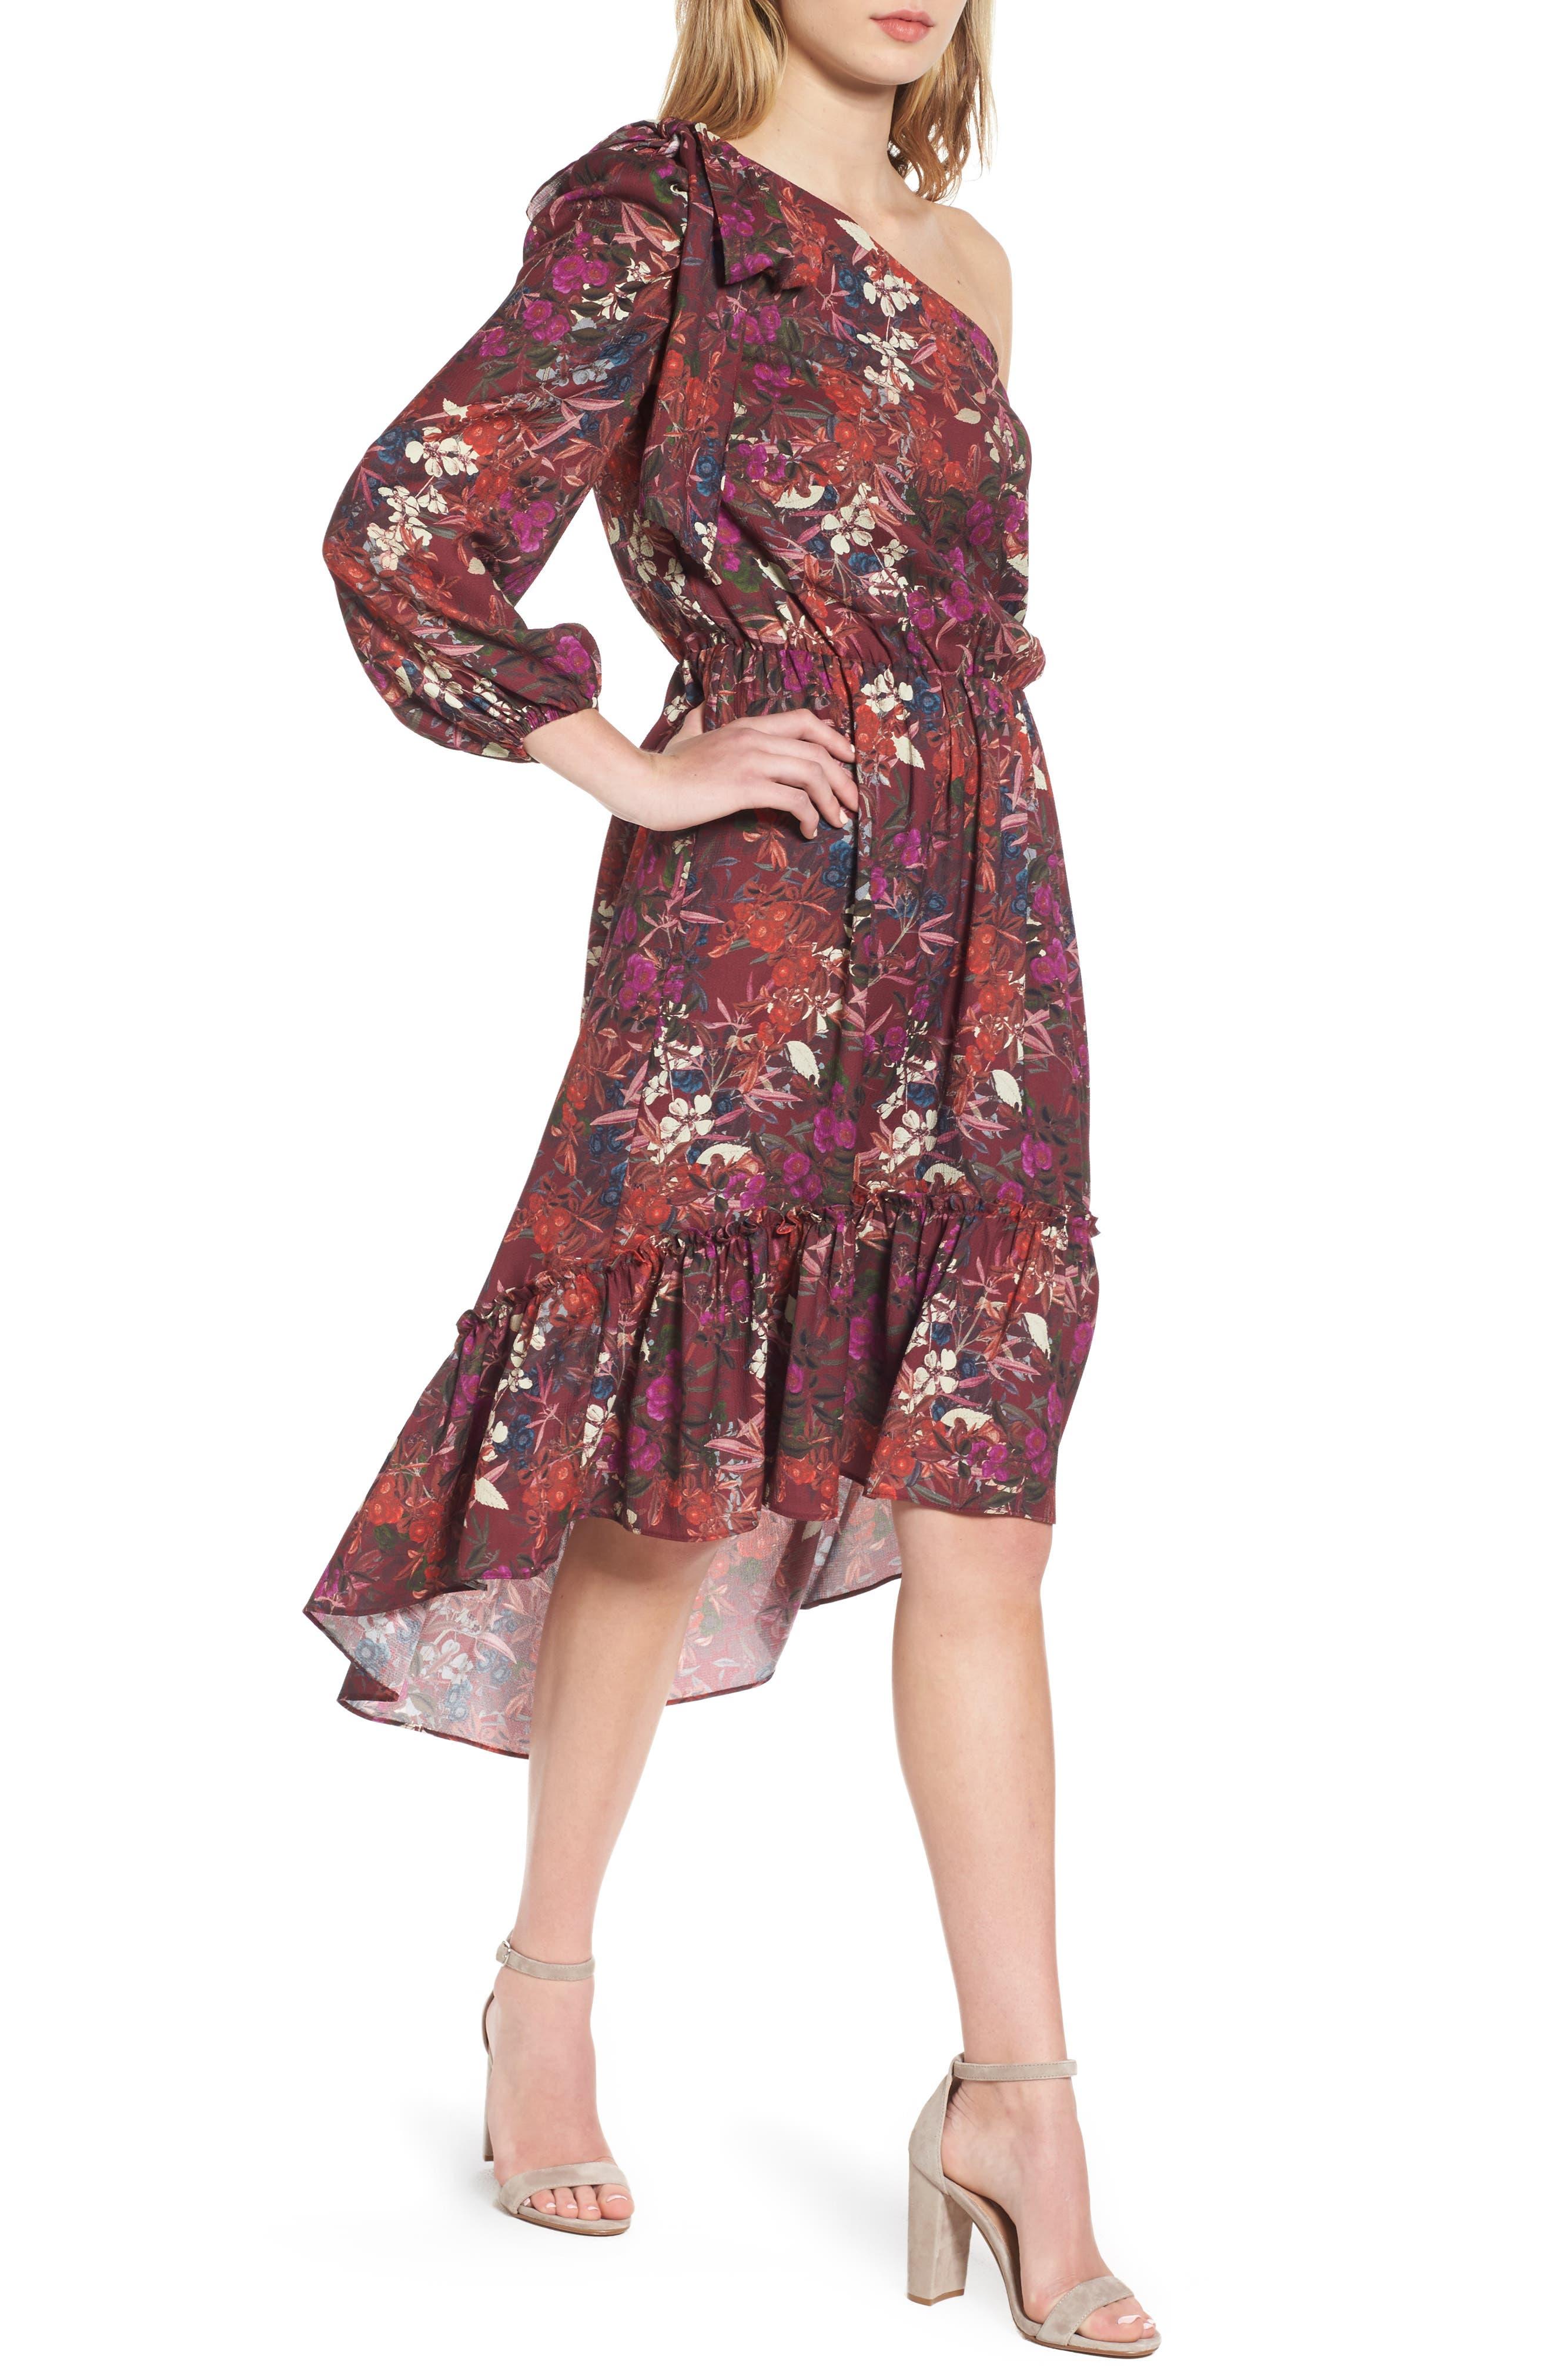 Alternate Image 1 Selected - Chelsea28 Asymmetrical Tiered Blouson Dress